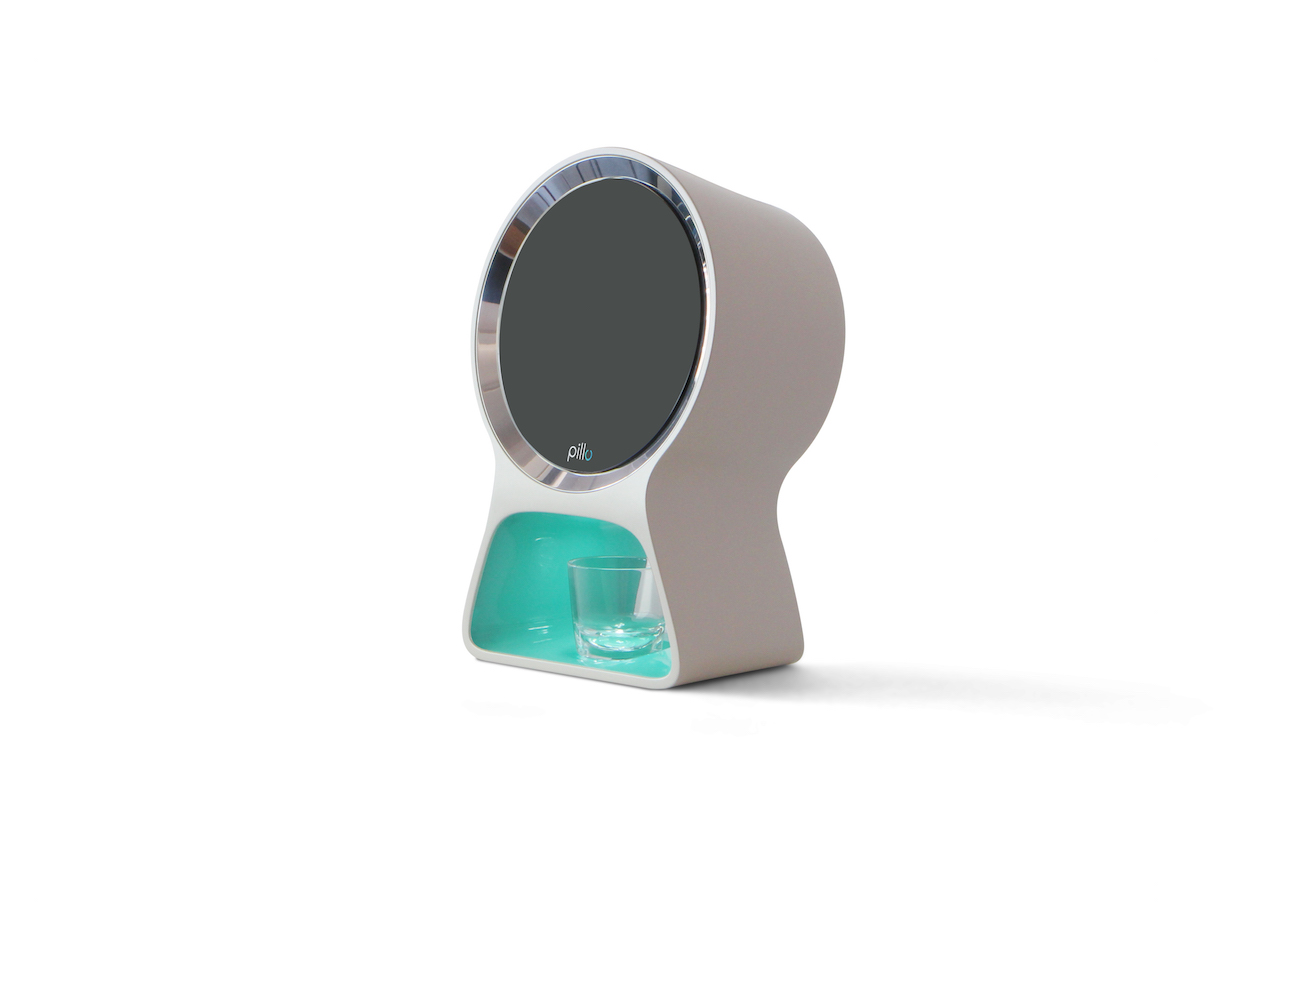 Pillo – World's First Intelligent Healthcare Robot